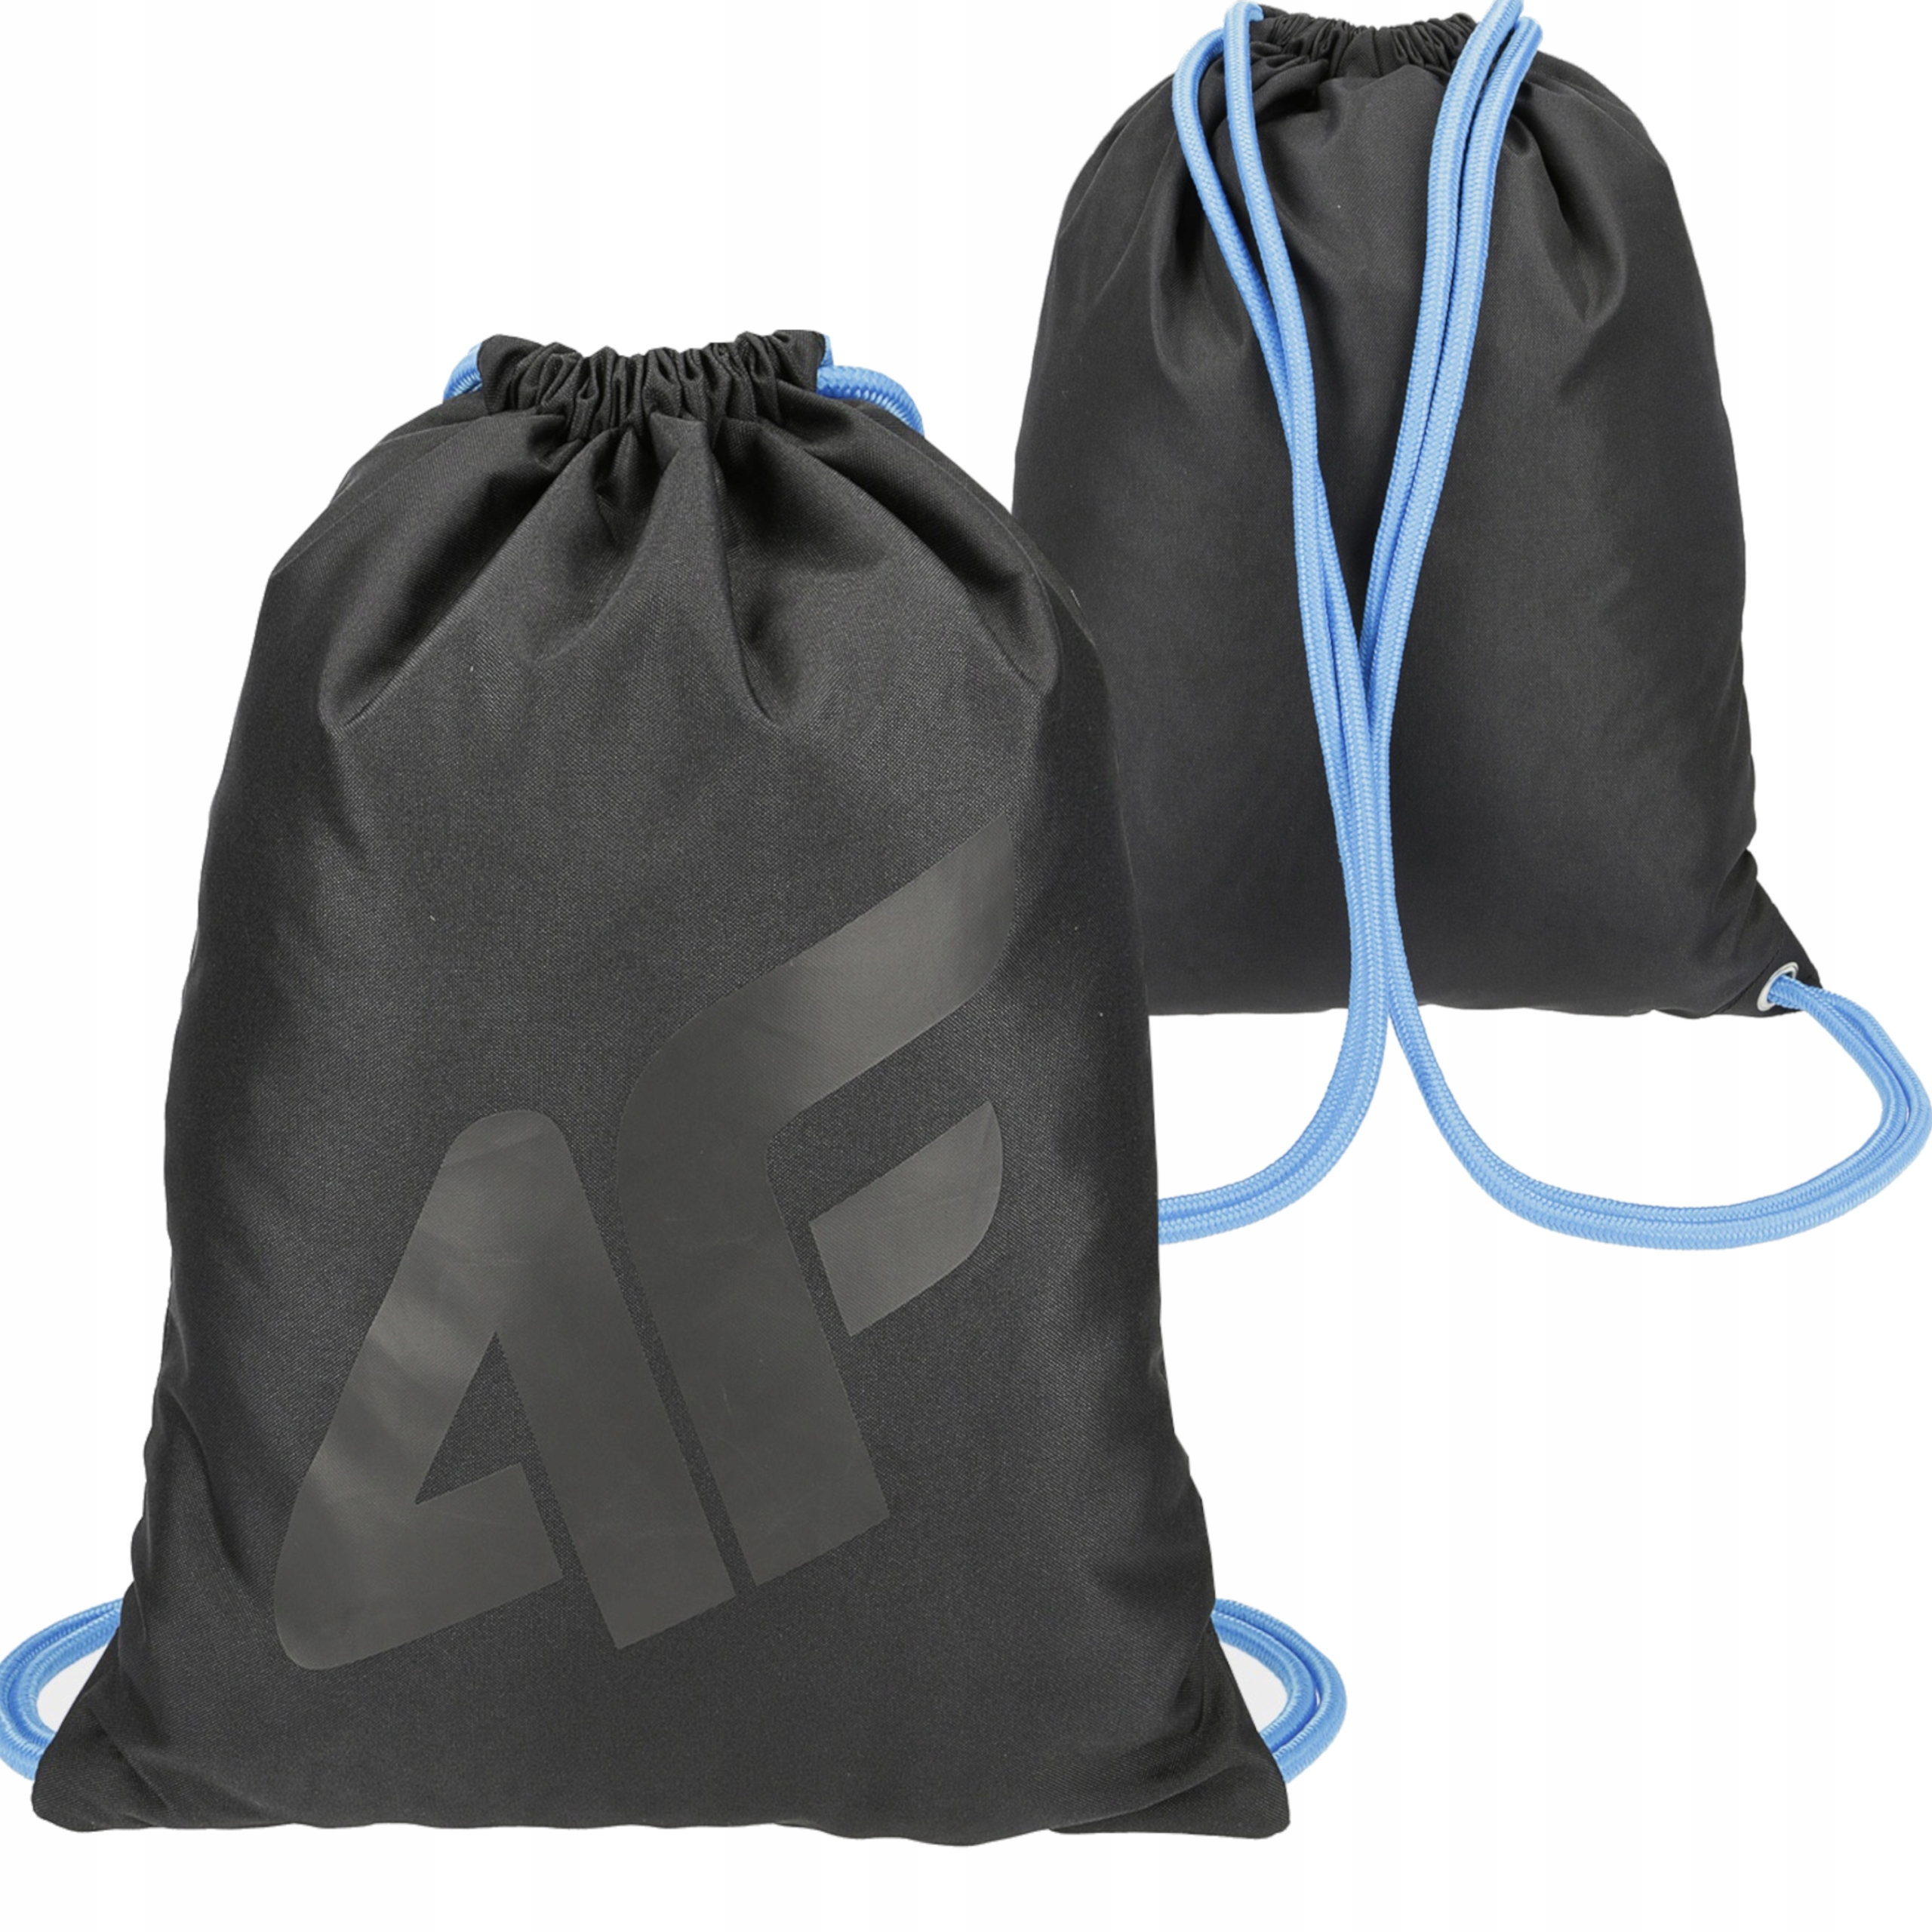 4f Plecak Worek Sportowy Na Buty Torba Jbagm002 9640948900 Allegro Pl